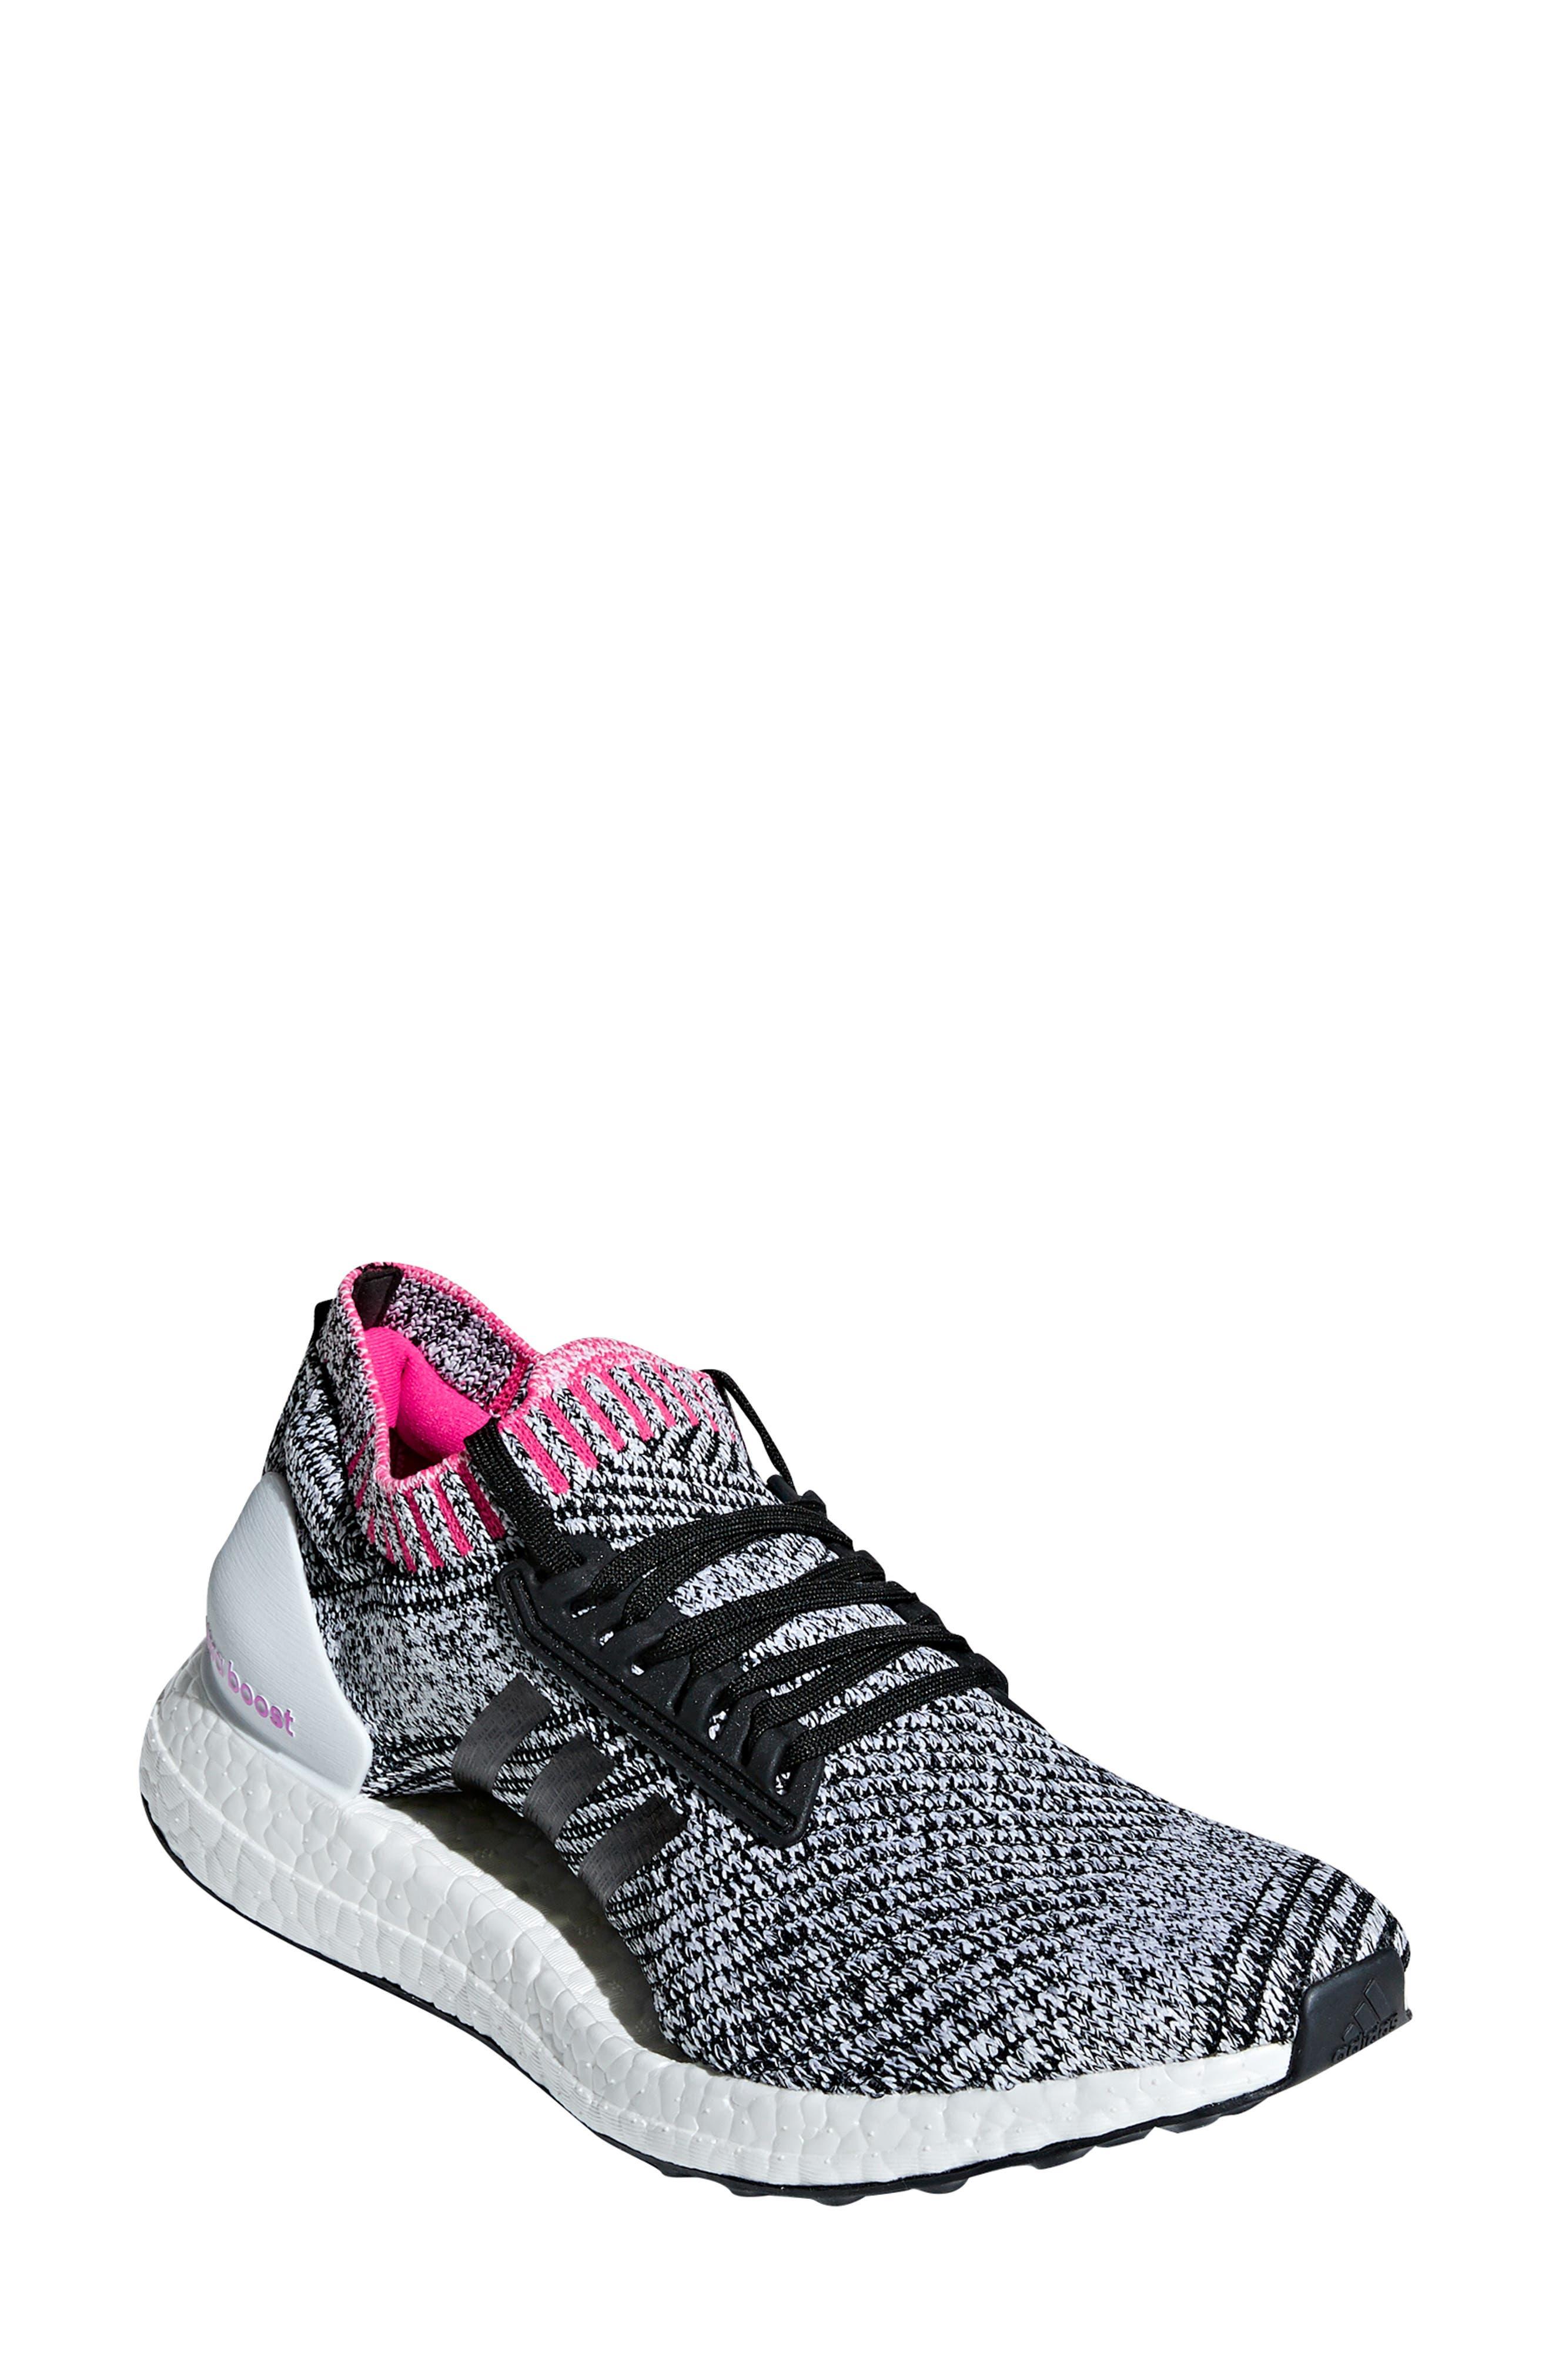 UltraBoost X Running Shoe,                             Main thumbnail 1, color,                             WHITE/ BLACK/ SHOCK PINK